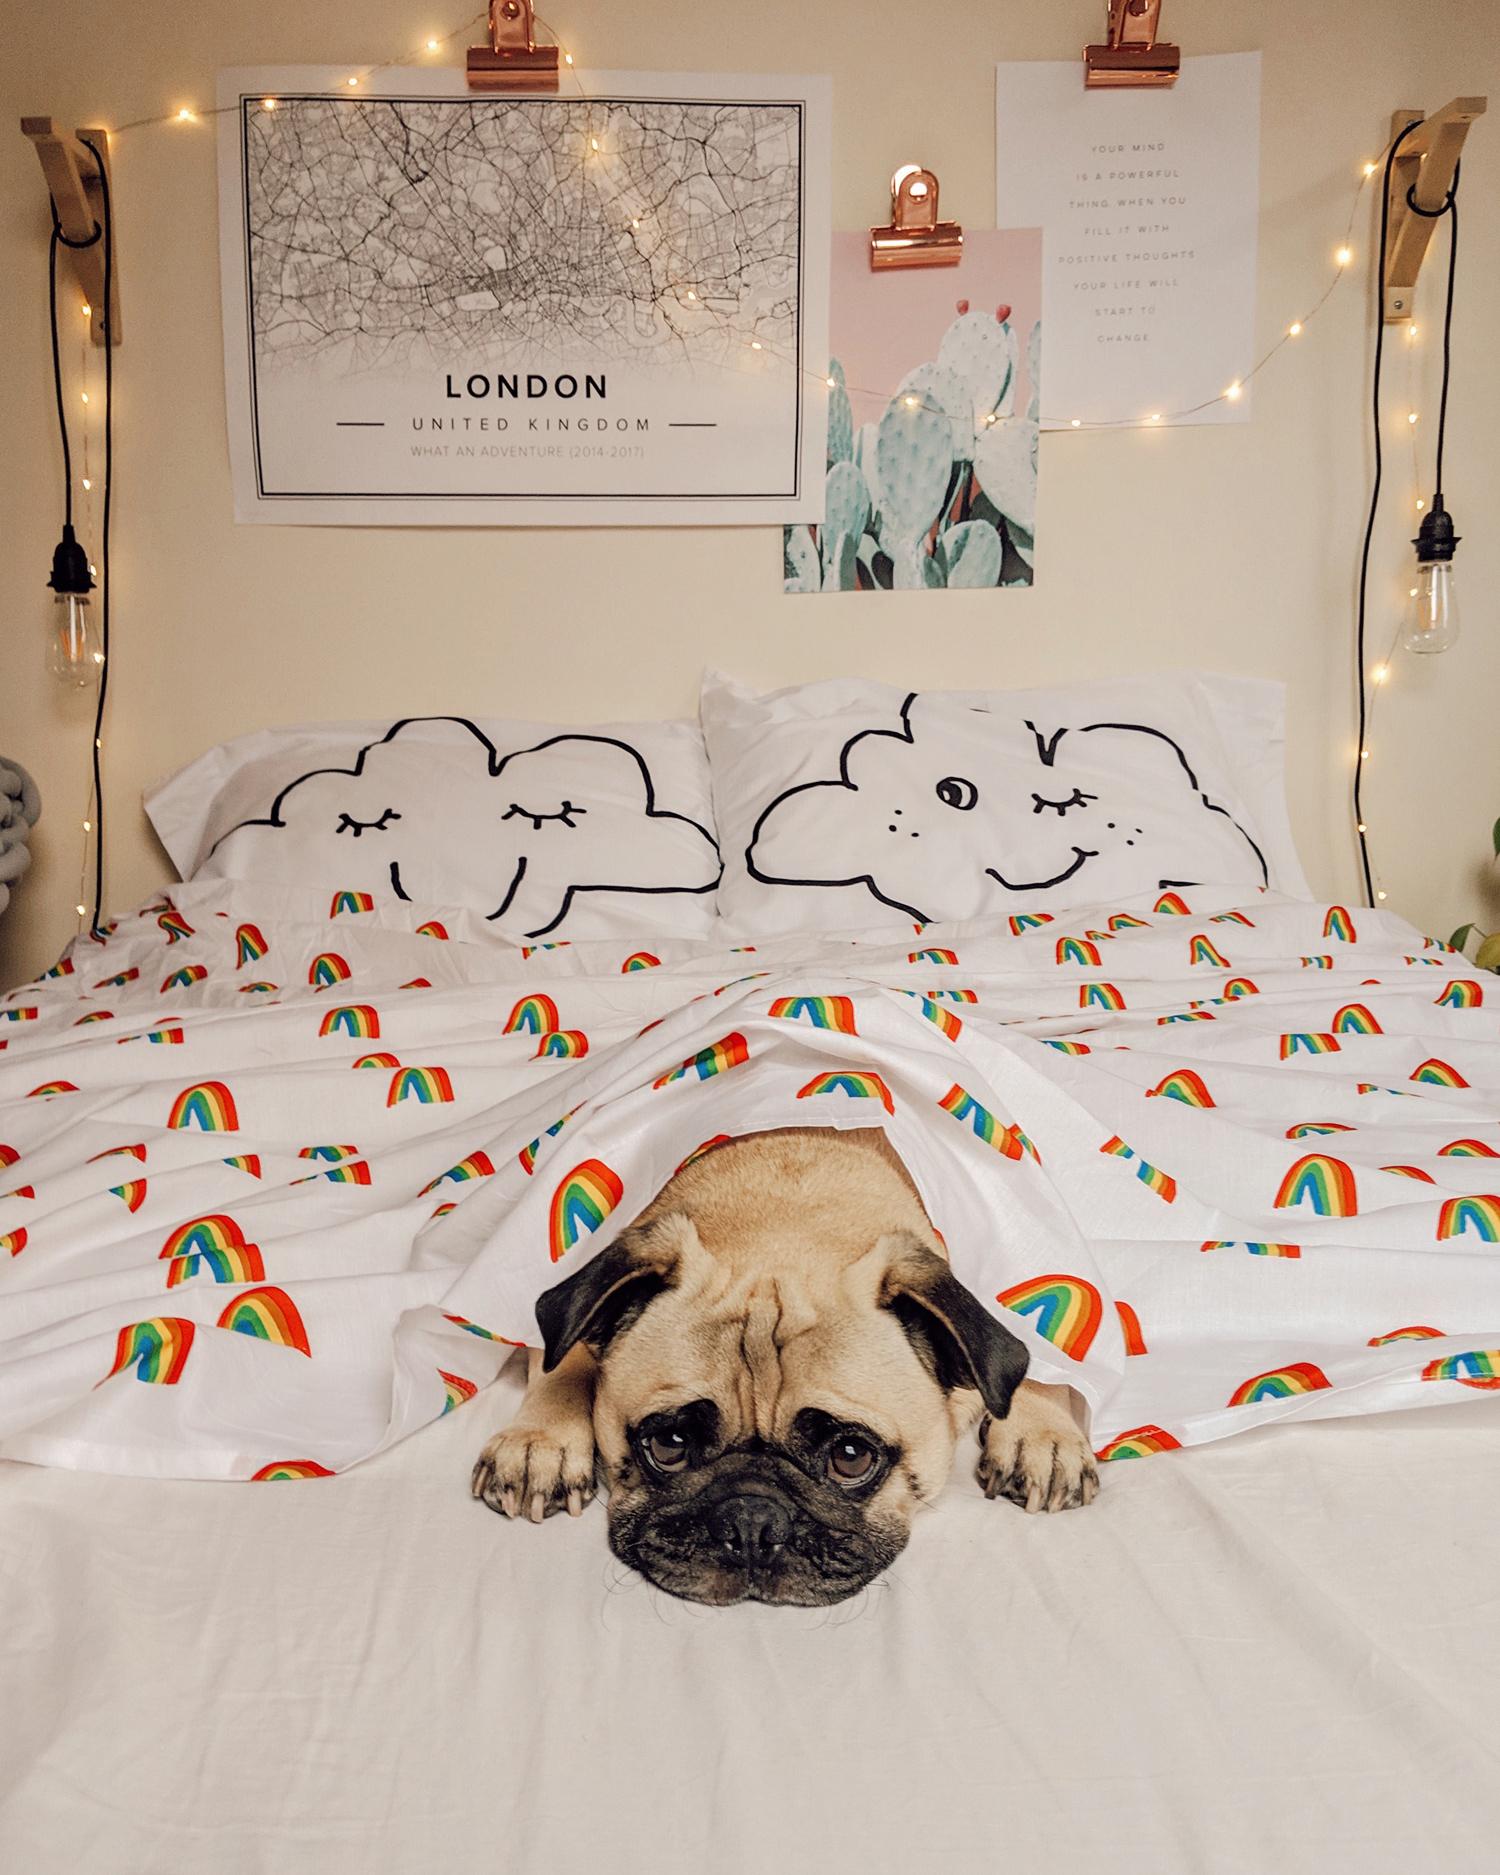 pug-puglife-dogblog-homeinspo-dogfriendly-lifestyle-newyork.jpg